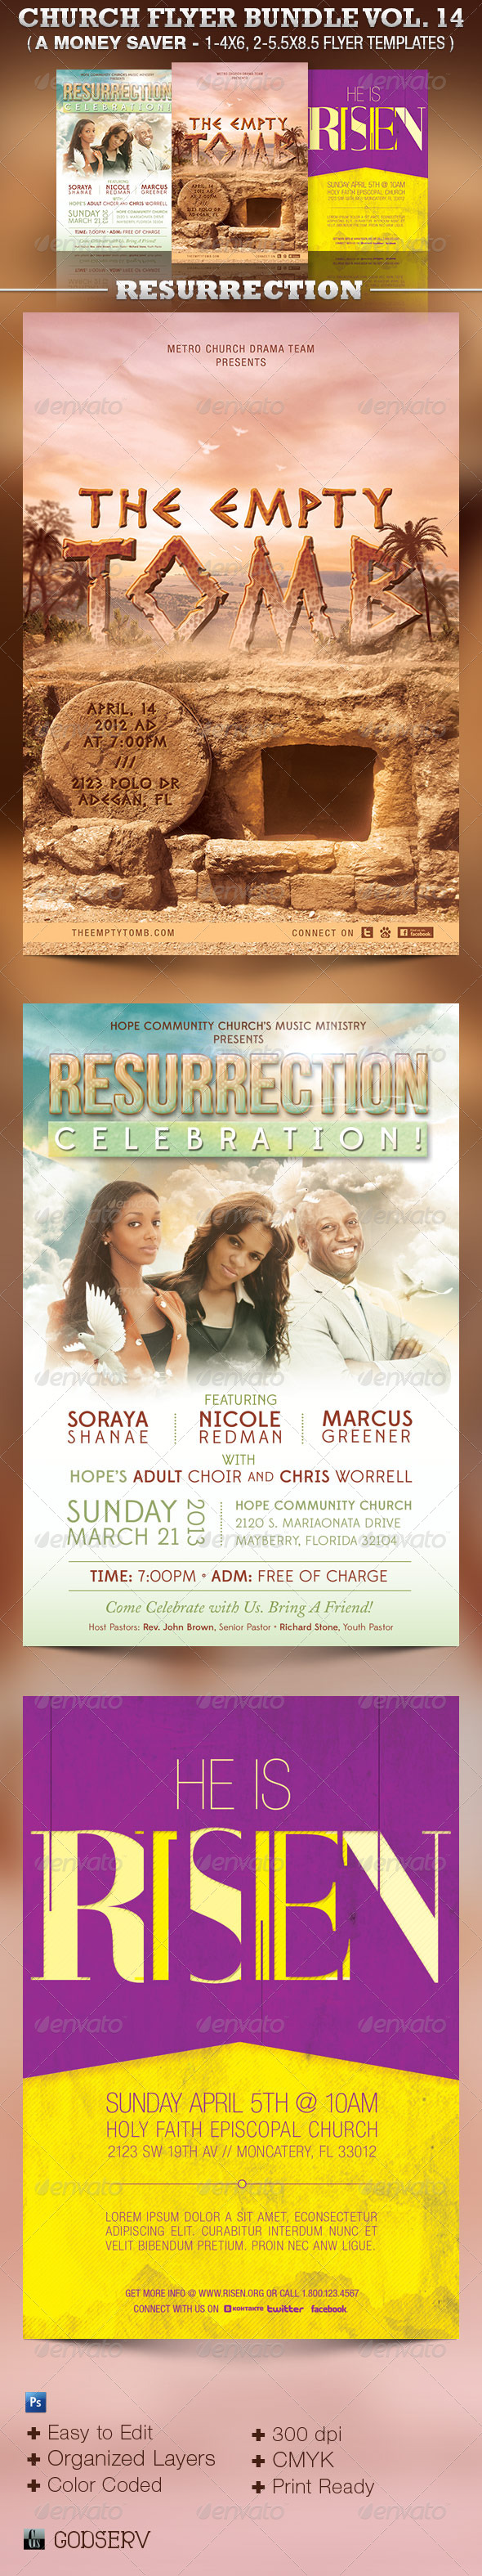 Resurrection Church Flyer Template Bundle Vol 14 - Church Flyers